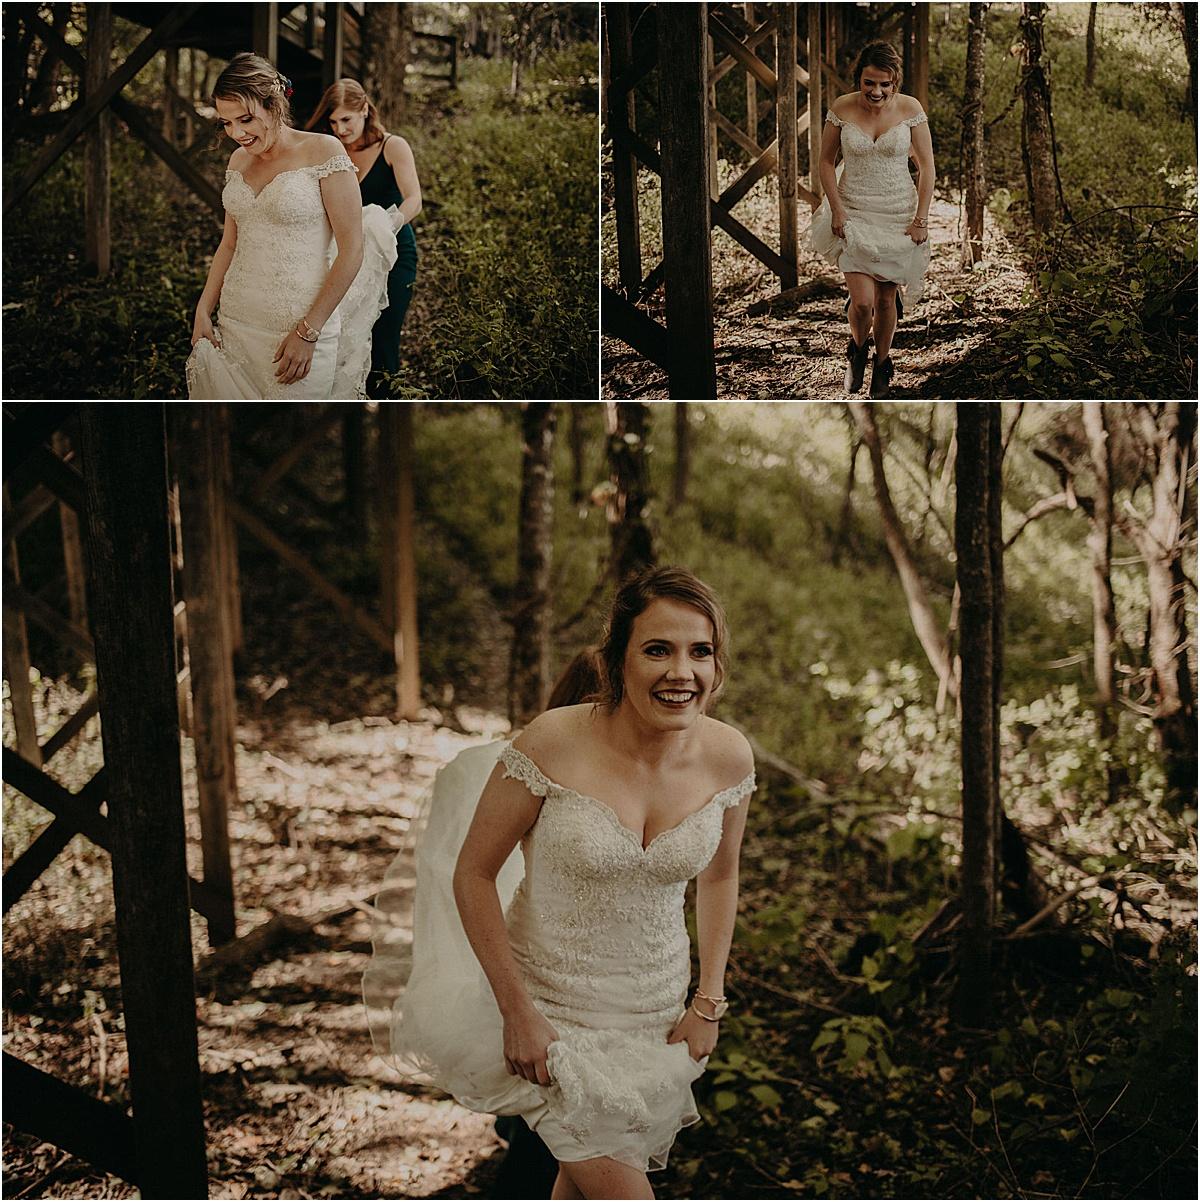 bride walking through the woods to her groom